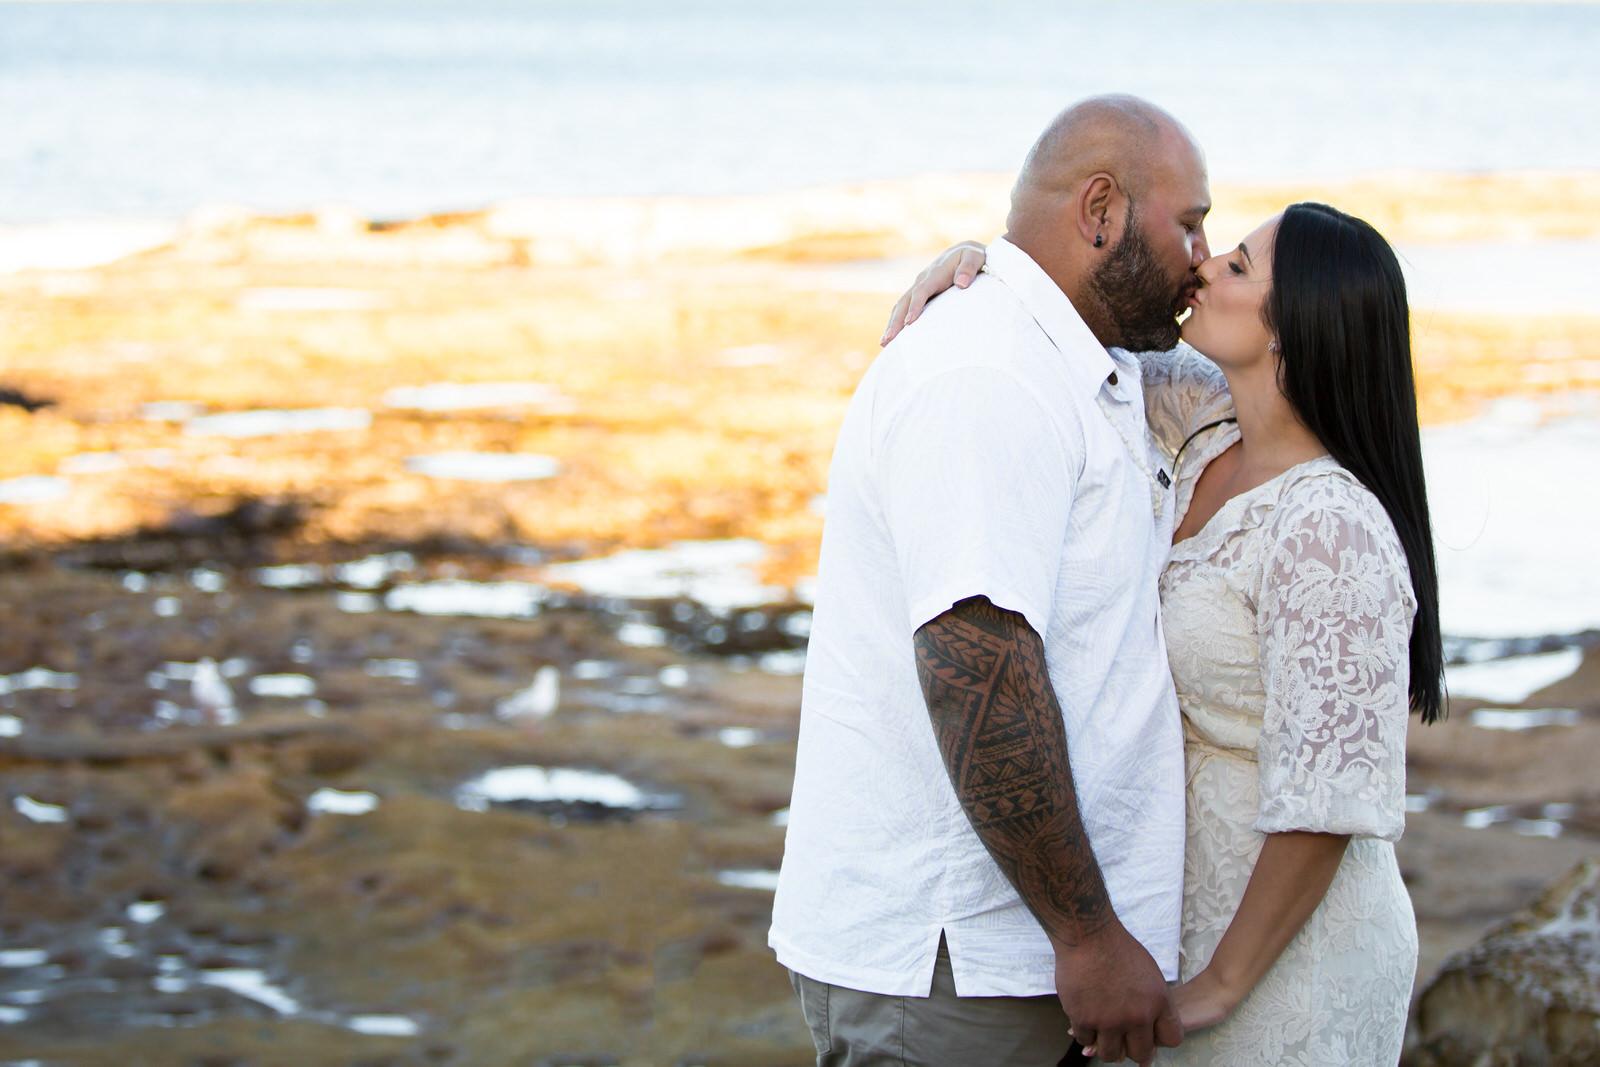 Sydney Wedding Photographer - Maroubra Beach - Jennifer Lam Photography (11).jpg